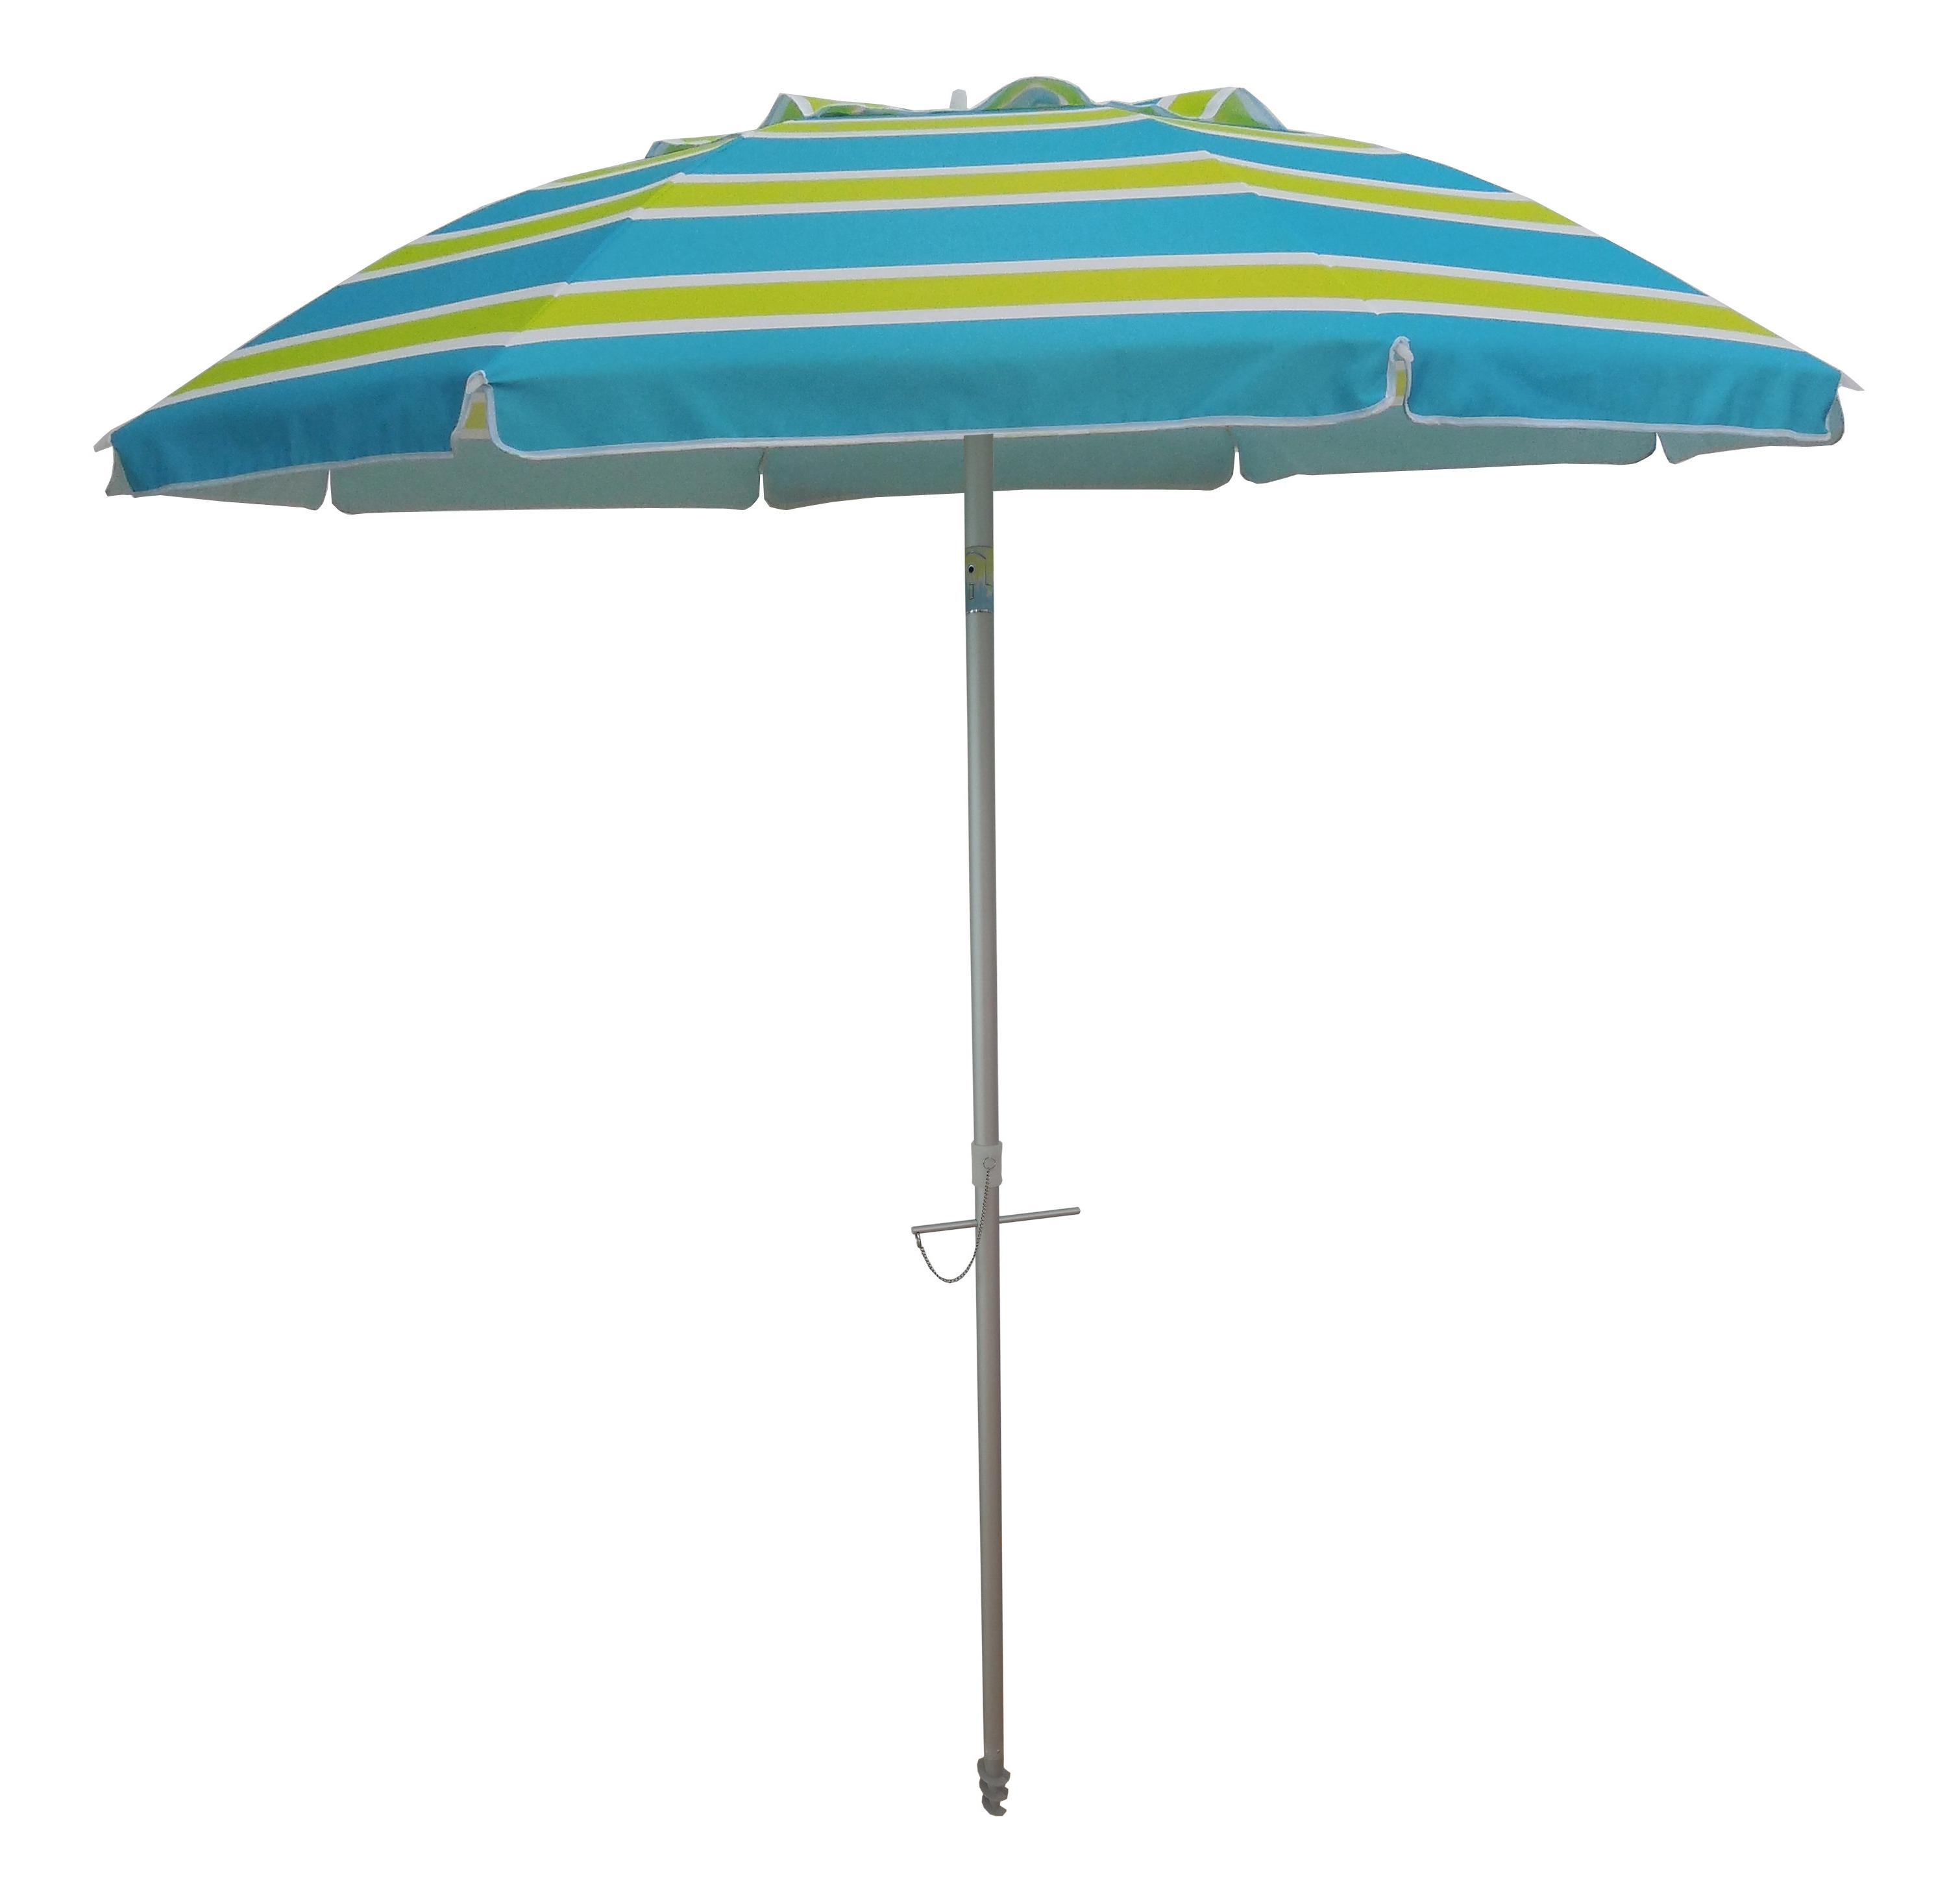 Famous 7' Beach Umbrella Throughout Schroeder Heavy Duty Beach Umbrellas (View 5 of 20)